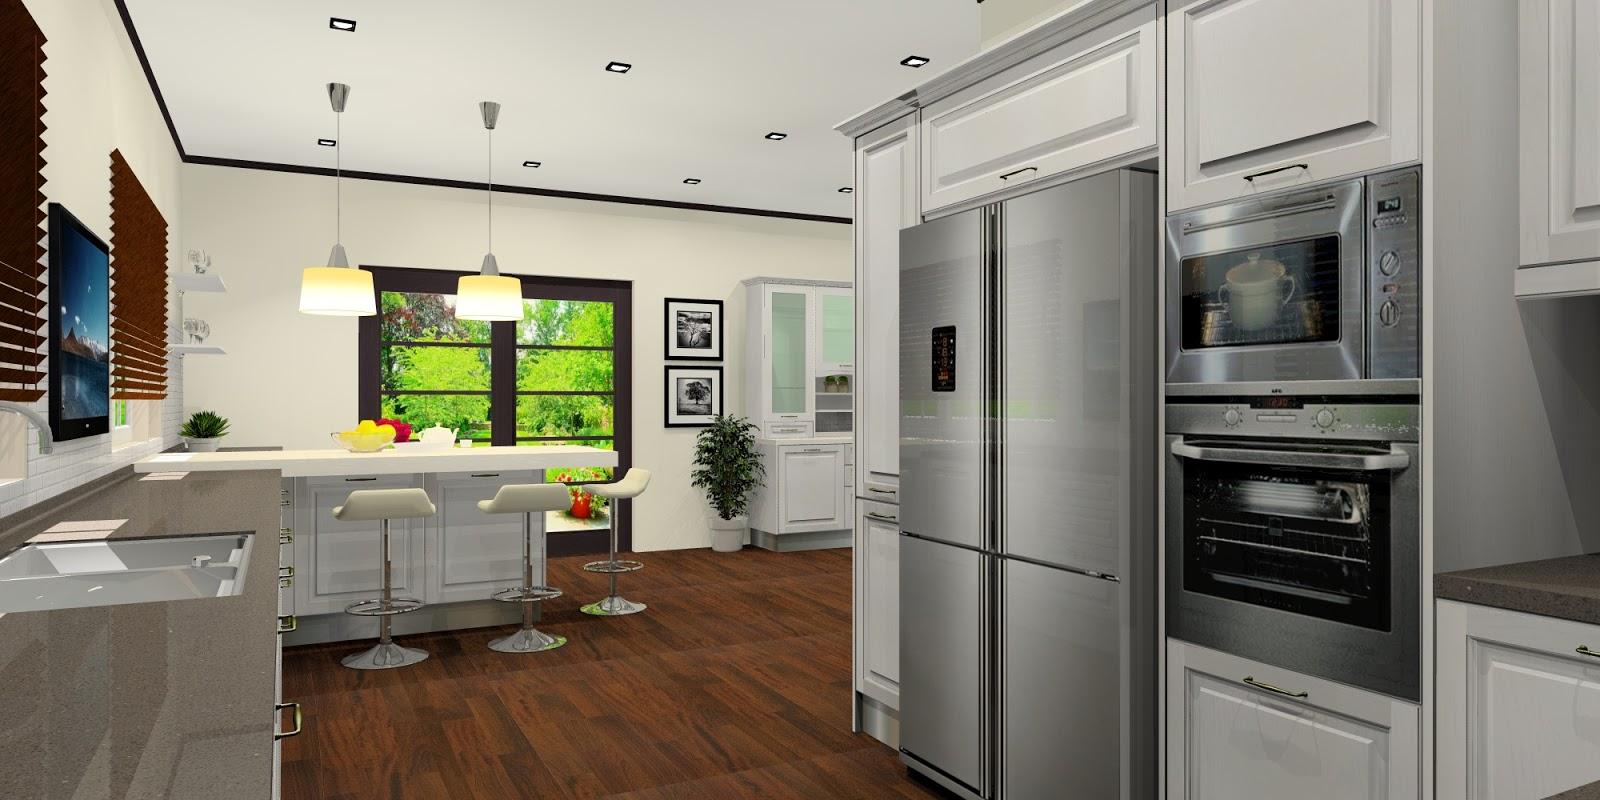 And Kitchen Design In Kuala Lumpur Selangor Malaysia White Country